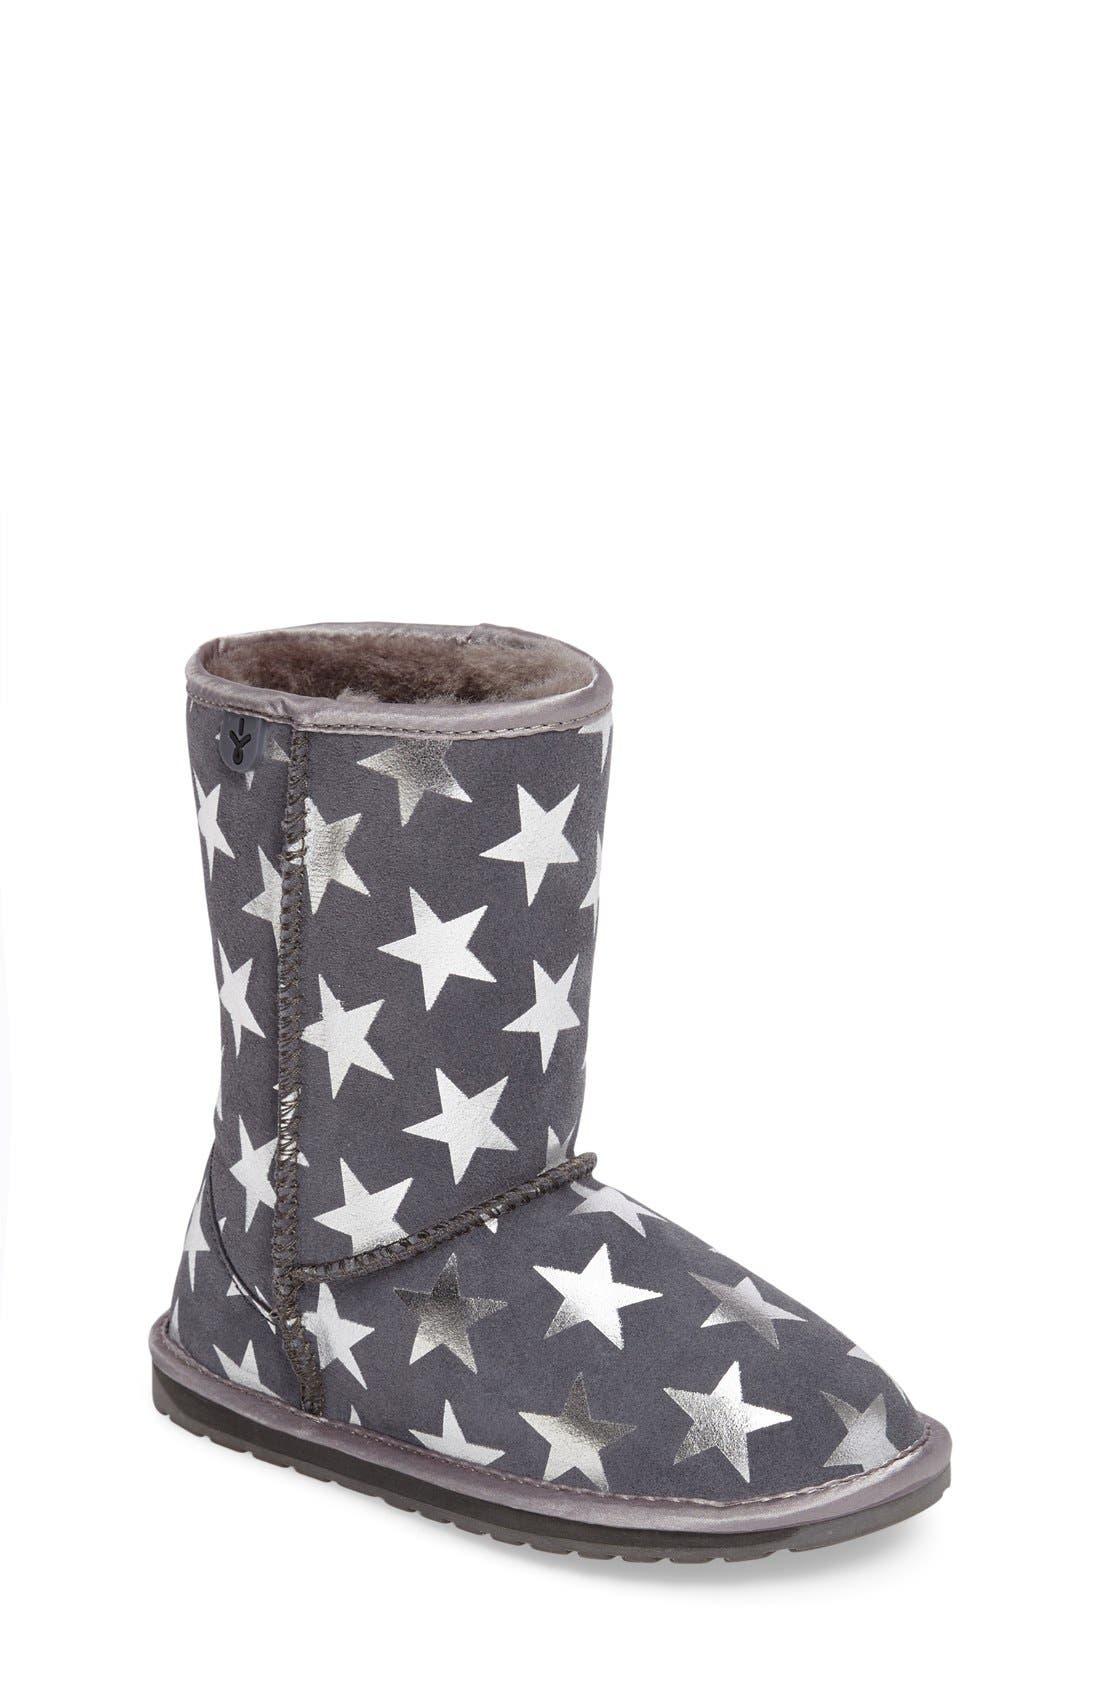 EMUAustralia 'Starry Night' Boot (Toddler, Little Kid & Big Kid)